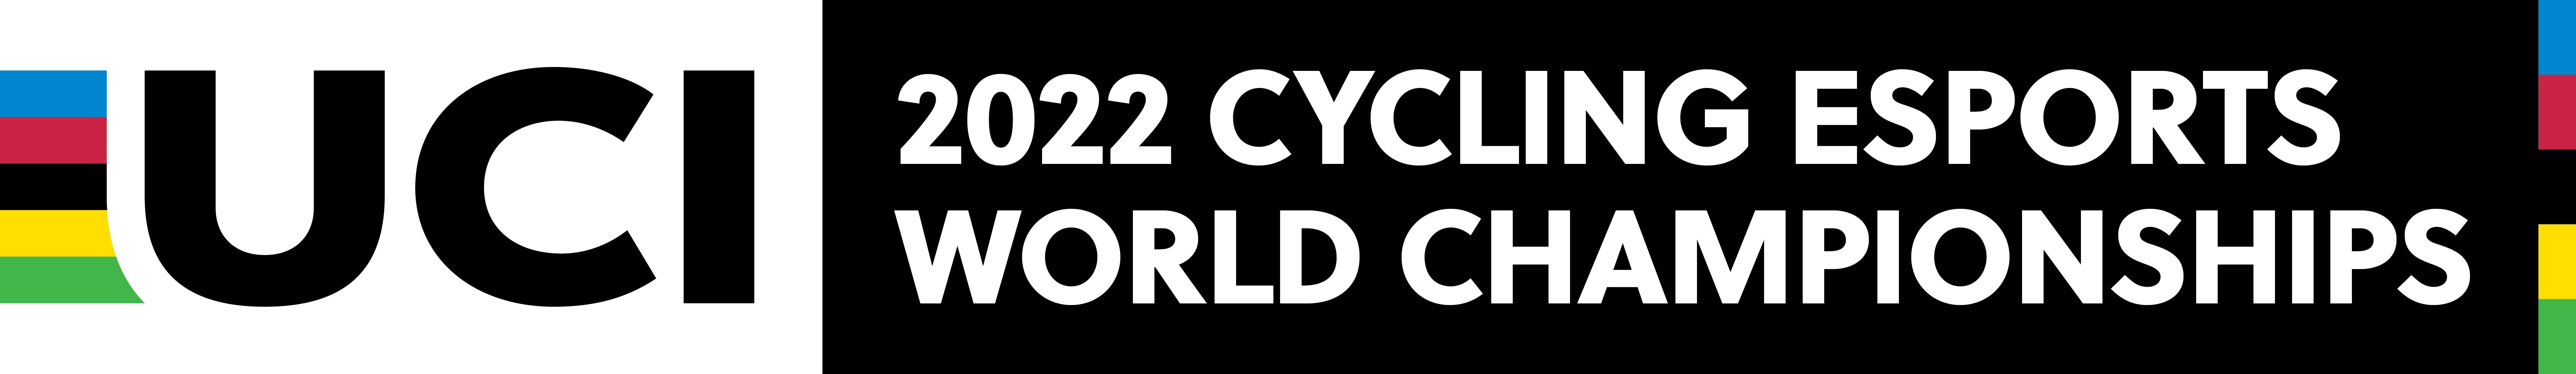 2022_UCI_CYCLING-ESPORTS_WCh_LOGO_CMYK_NEUTRAL.png